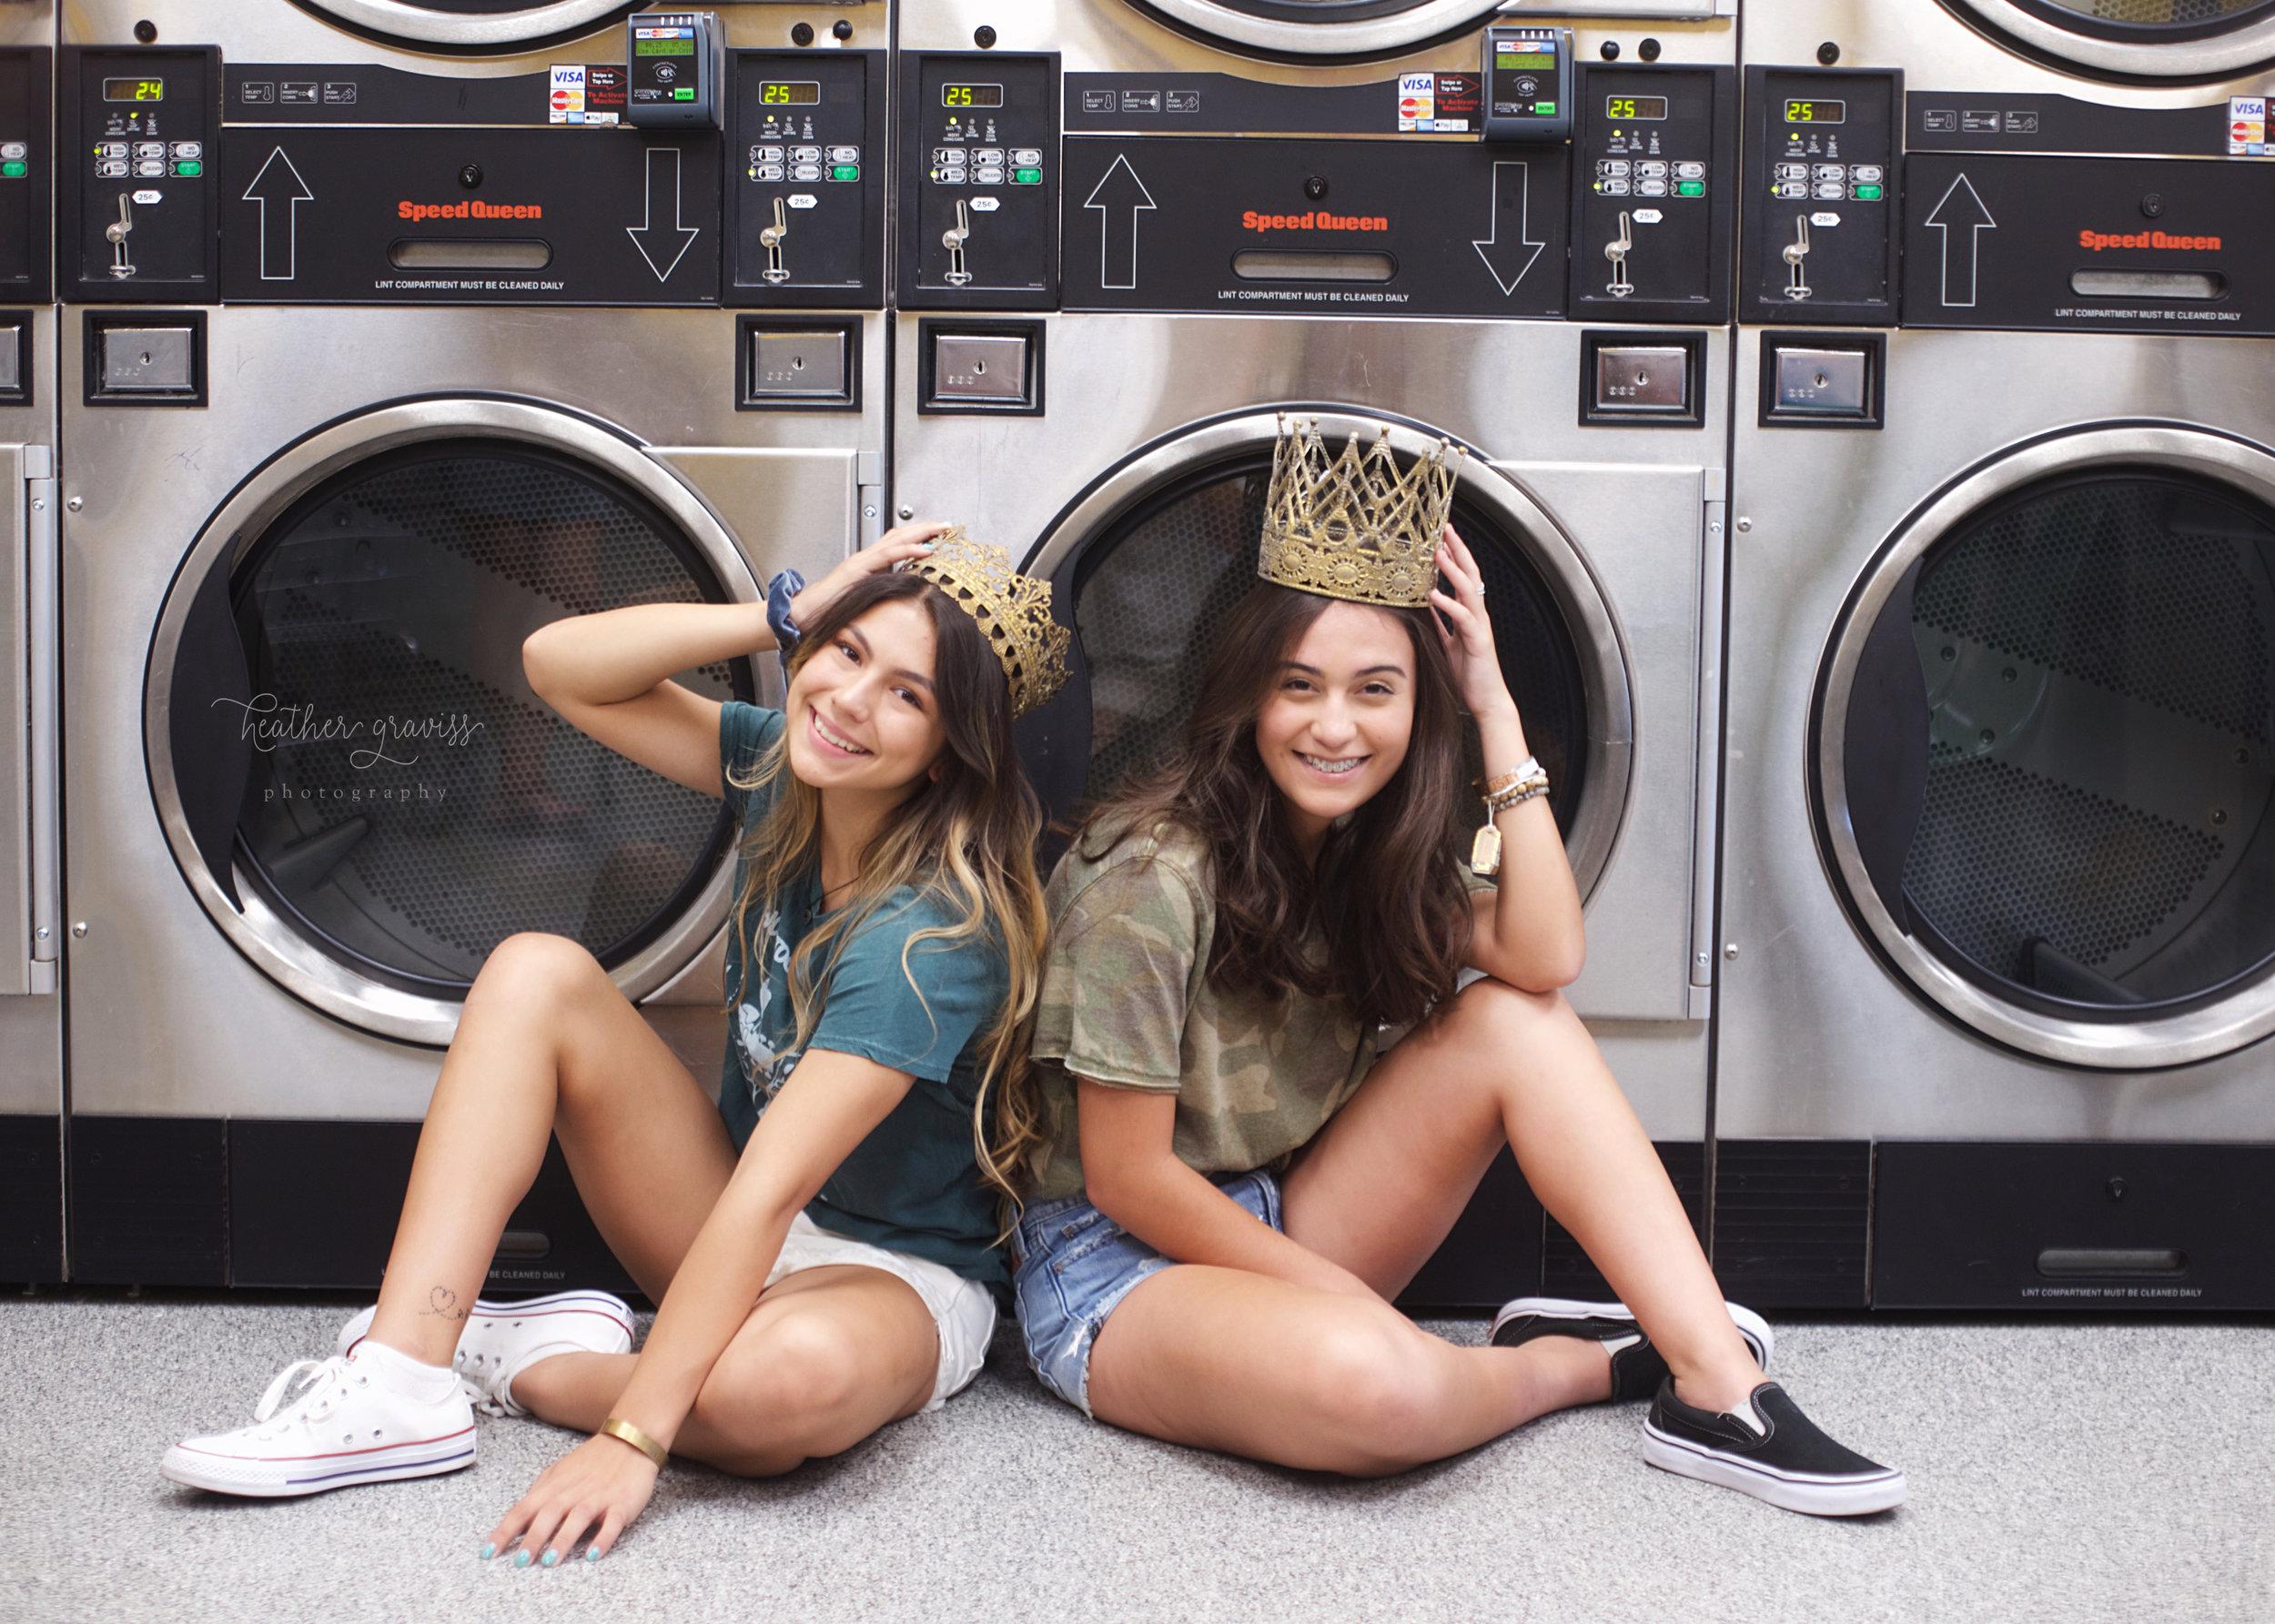 princess laundromat.jpg